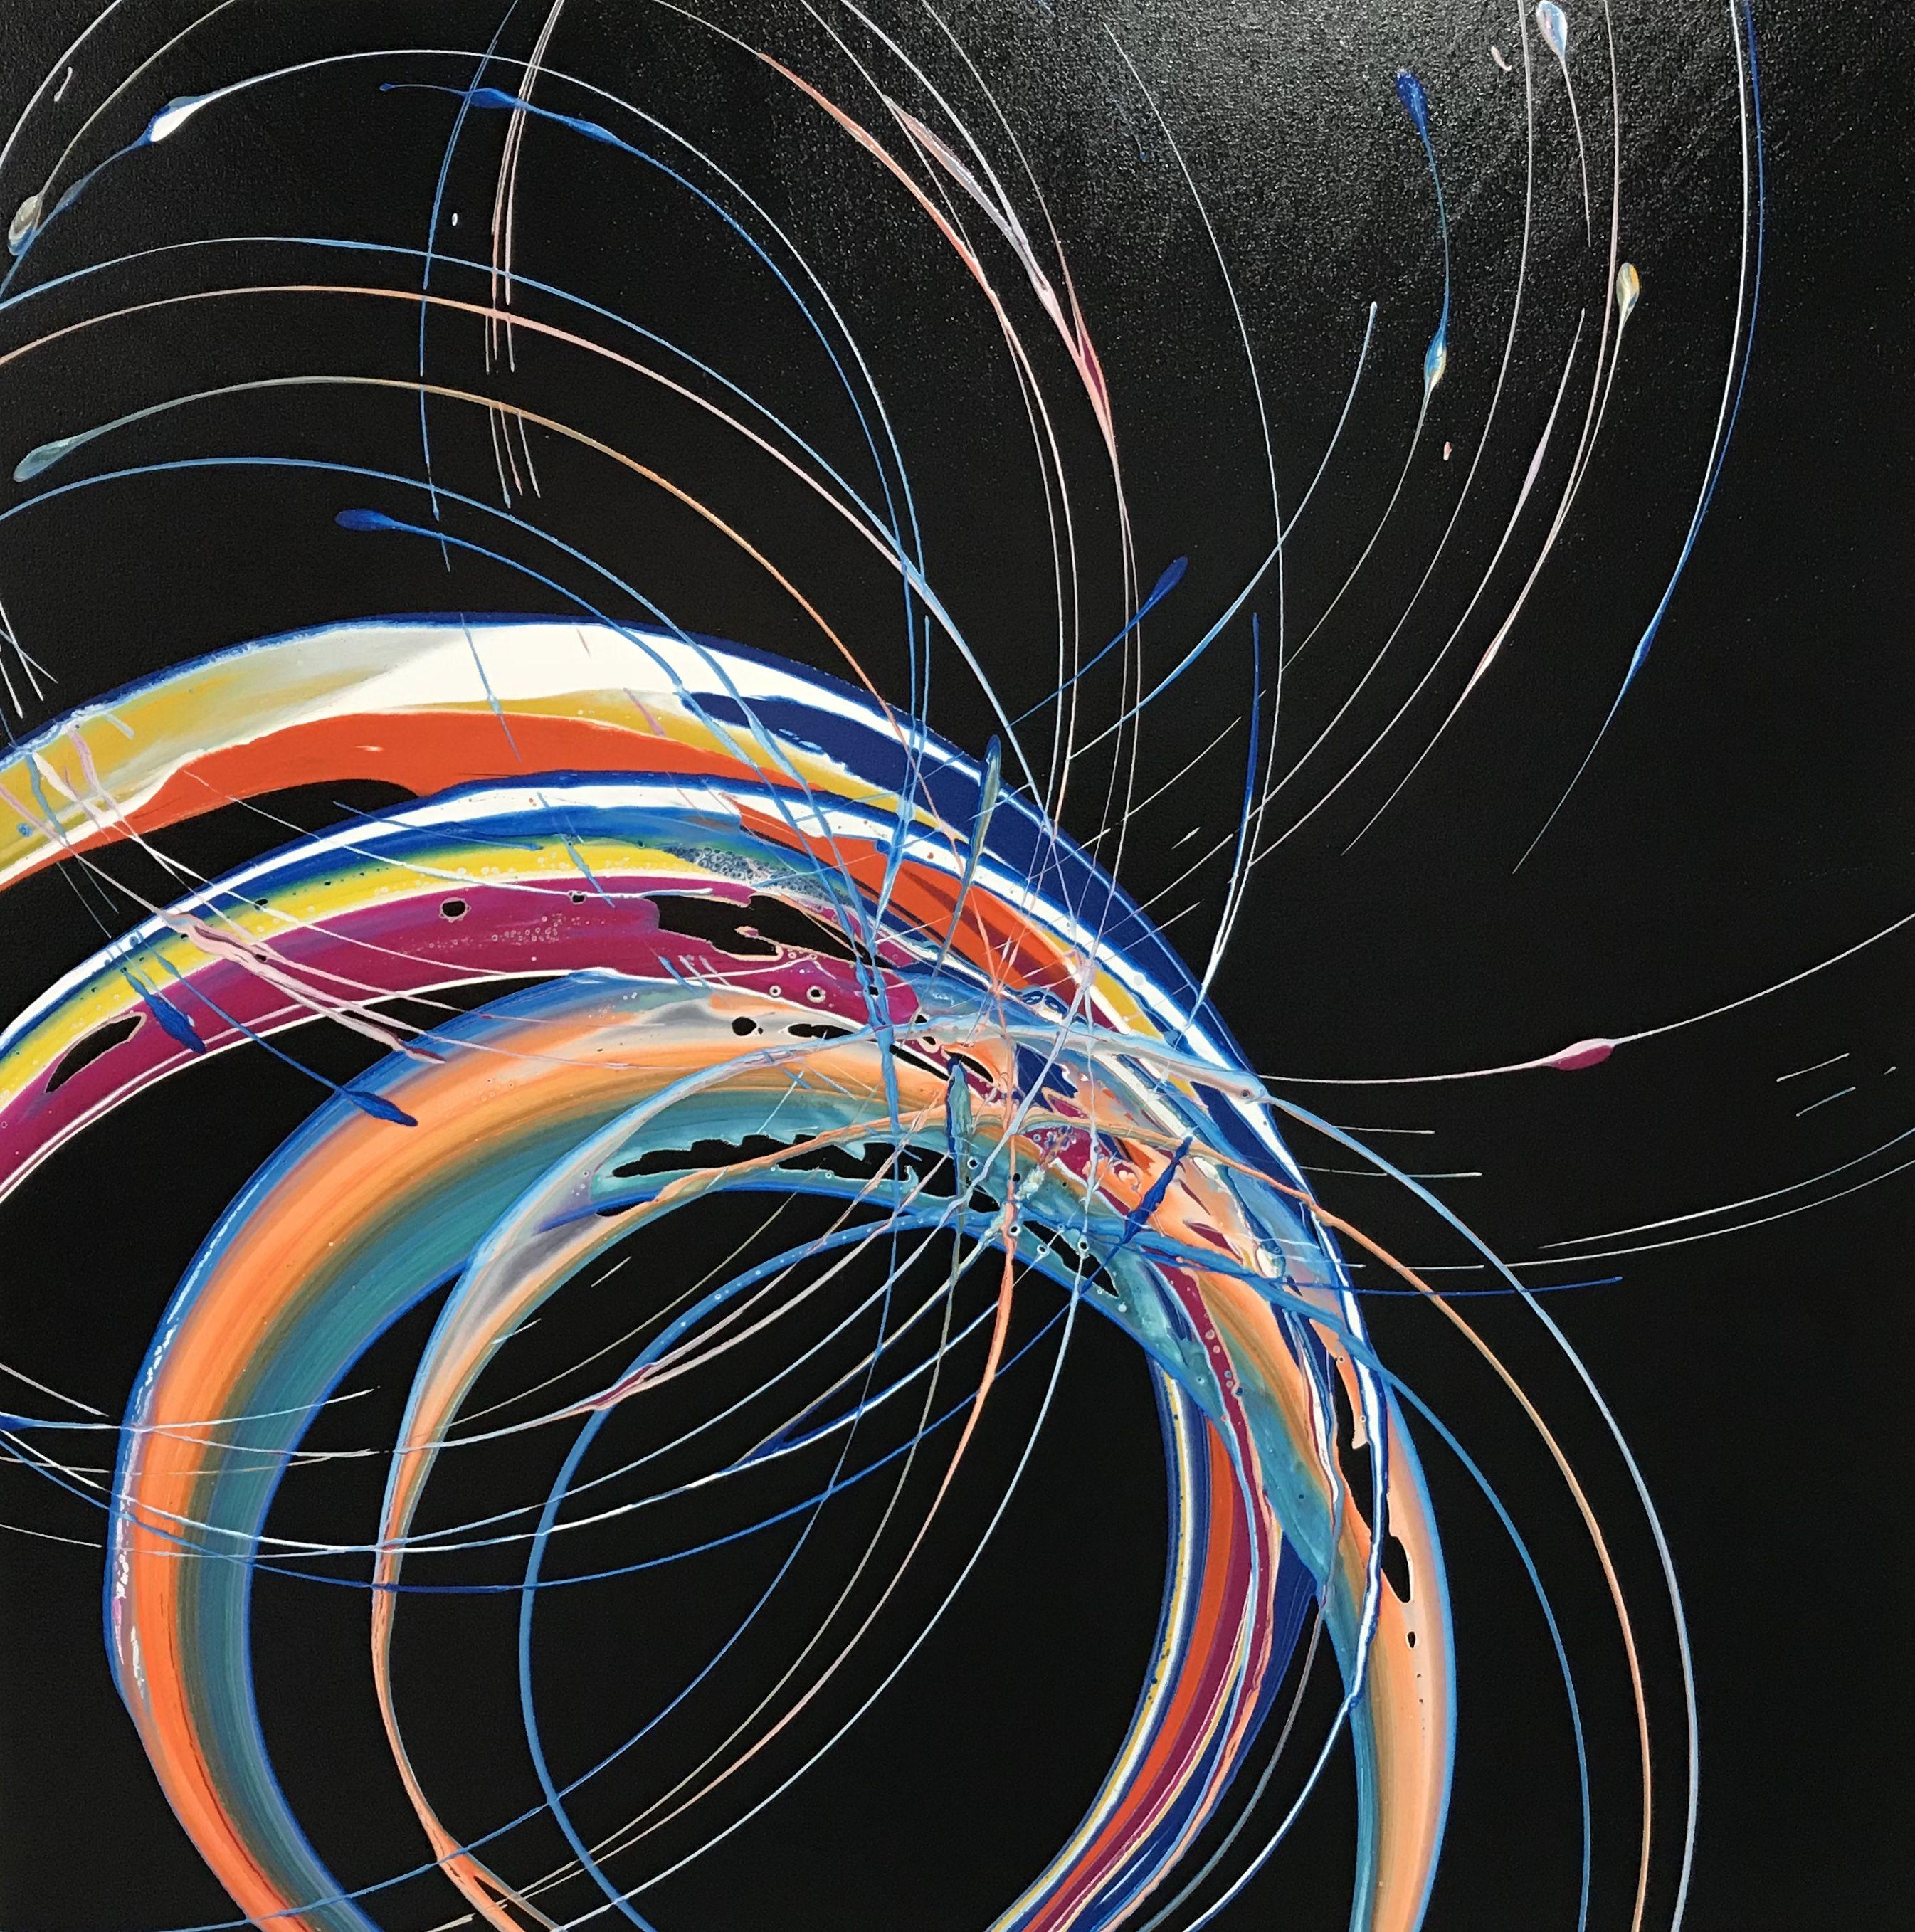 Artwork by Glenn Farquhar 90cm x 90cm created at Art